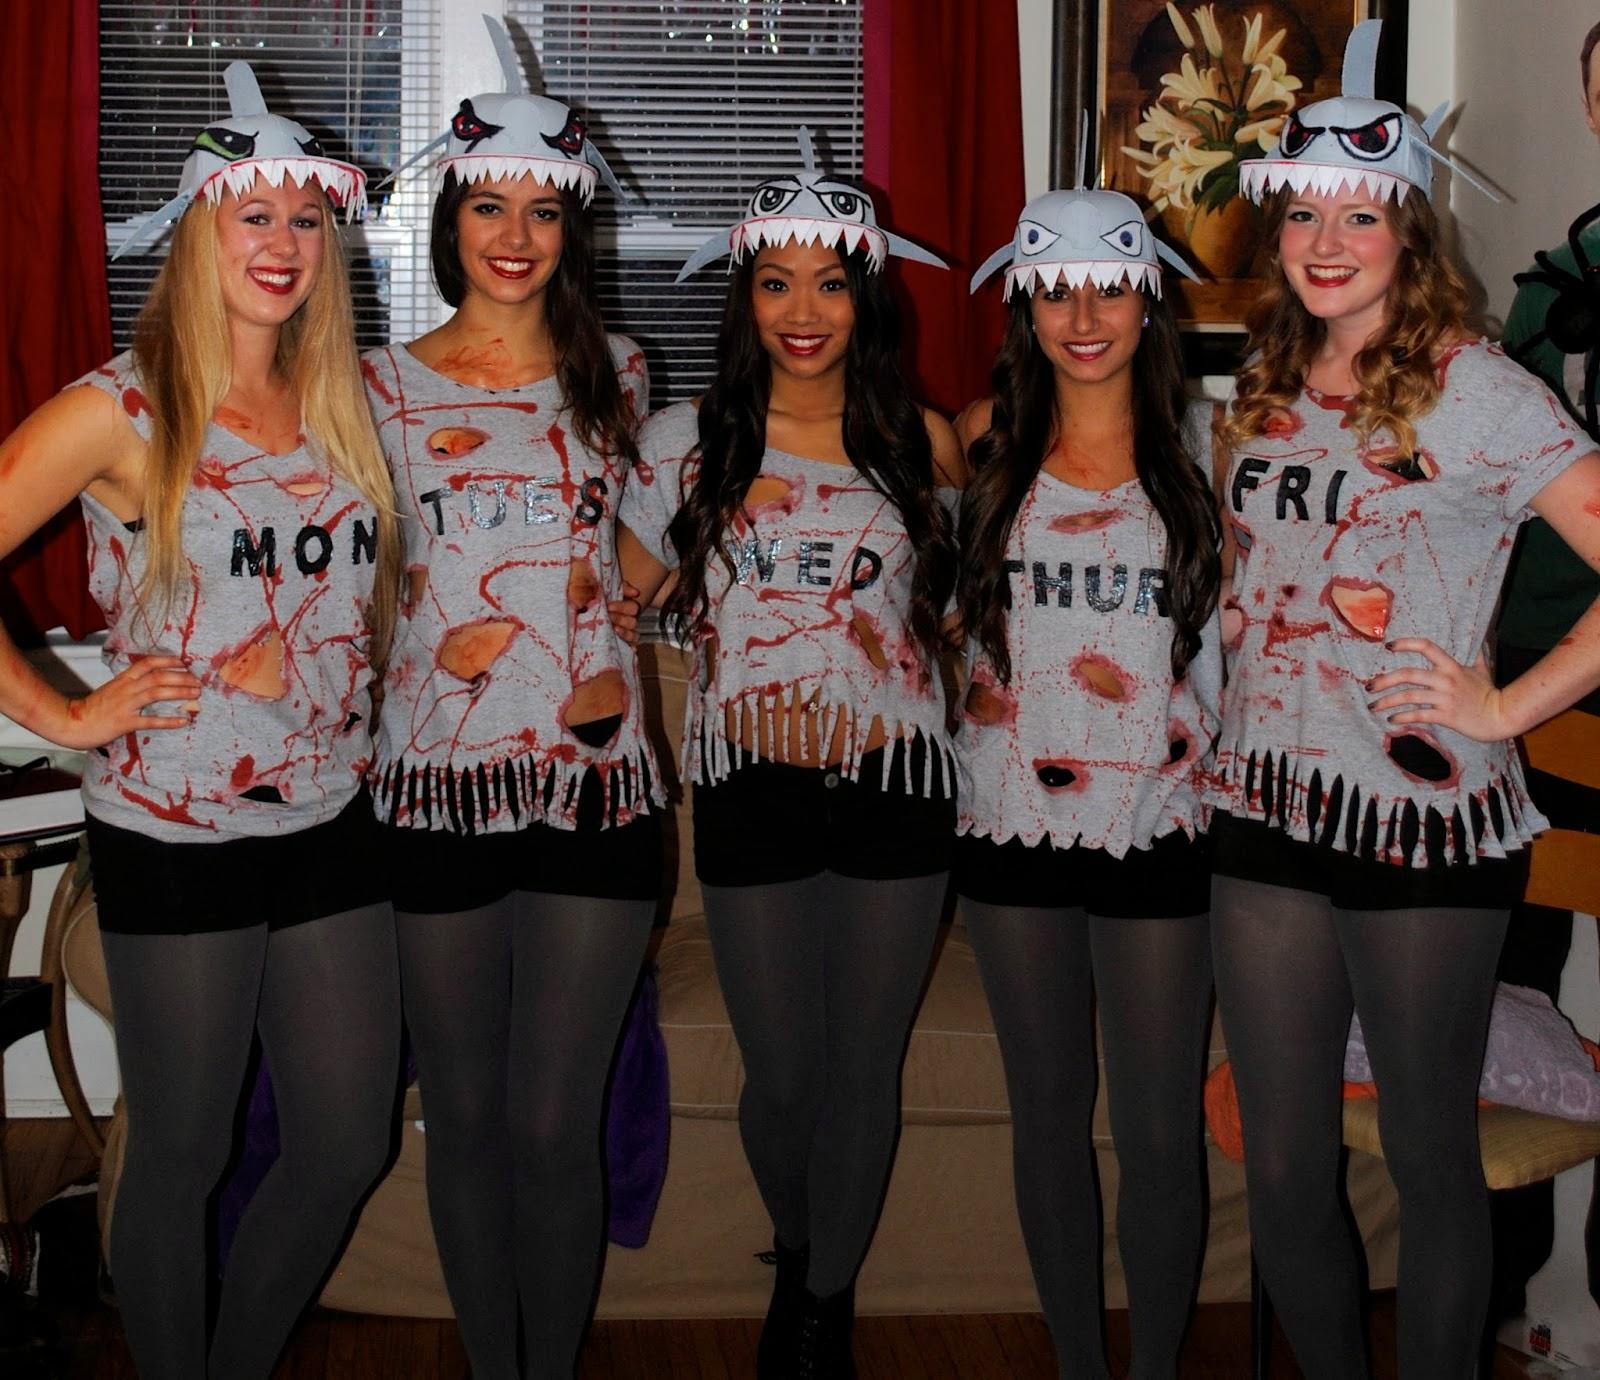 Halloween Costumes For 4 Friends.That Flour Child Shark Week Halloween Group Costume